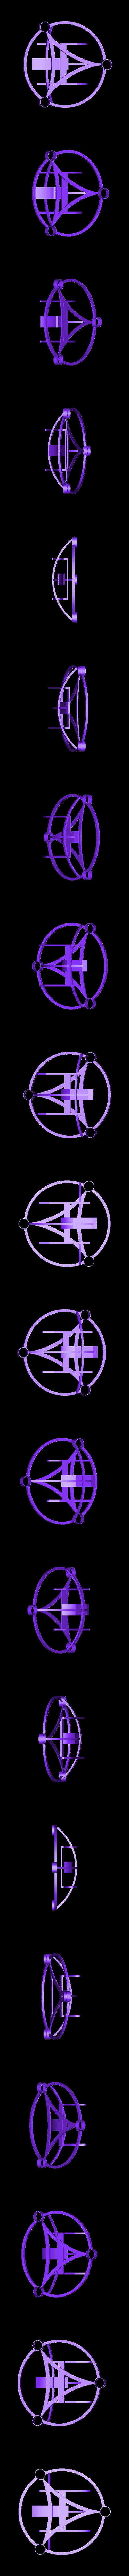 Drone_VTOL_1.2.stl Download free STL file Sacred Geometry Drone VTOL Frame • 3D printer design, AlbertKhan3D